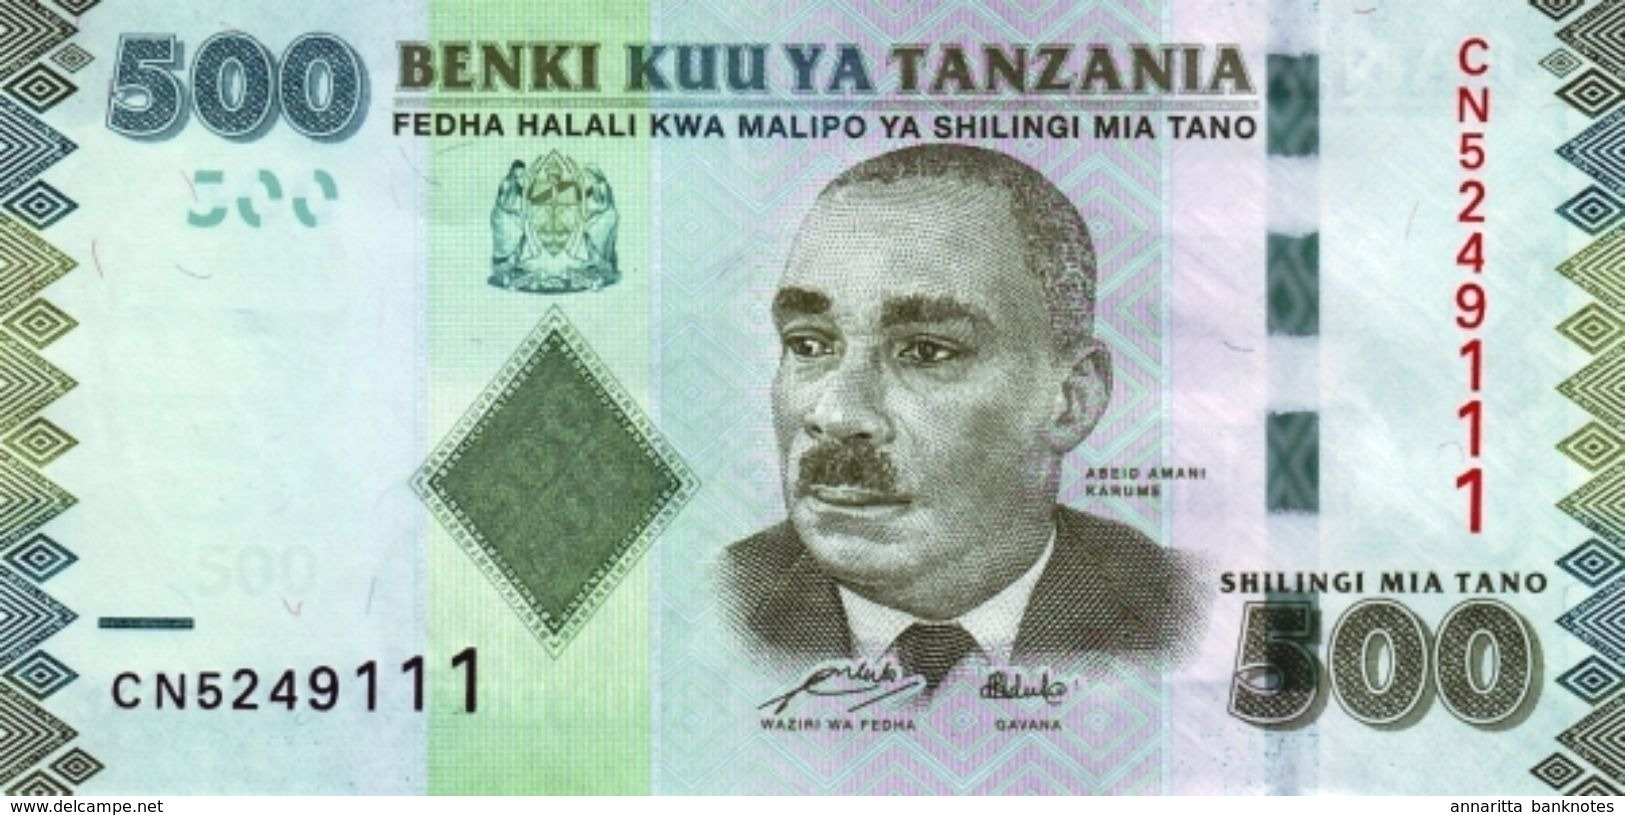 TANZANIA 500 SHILLINGS ND (2011) P-40a UNC [TZ139a] - Tanzanie